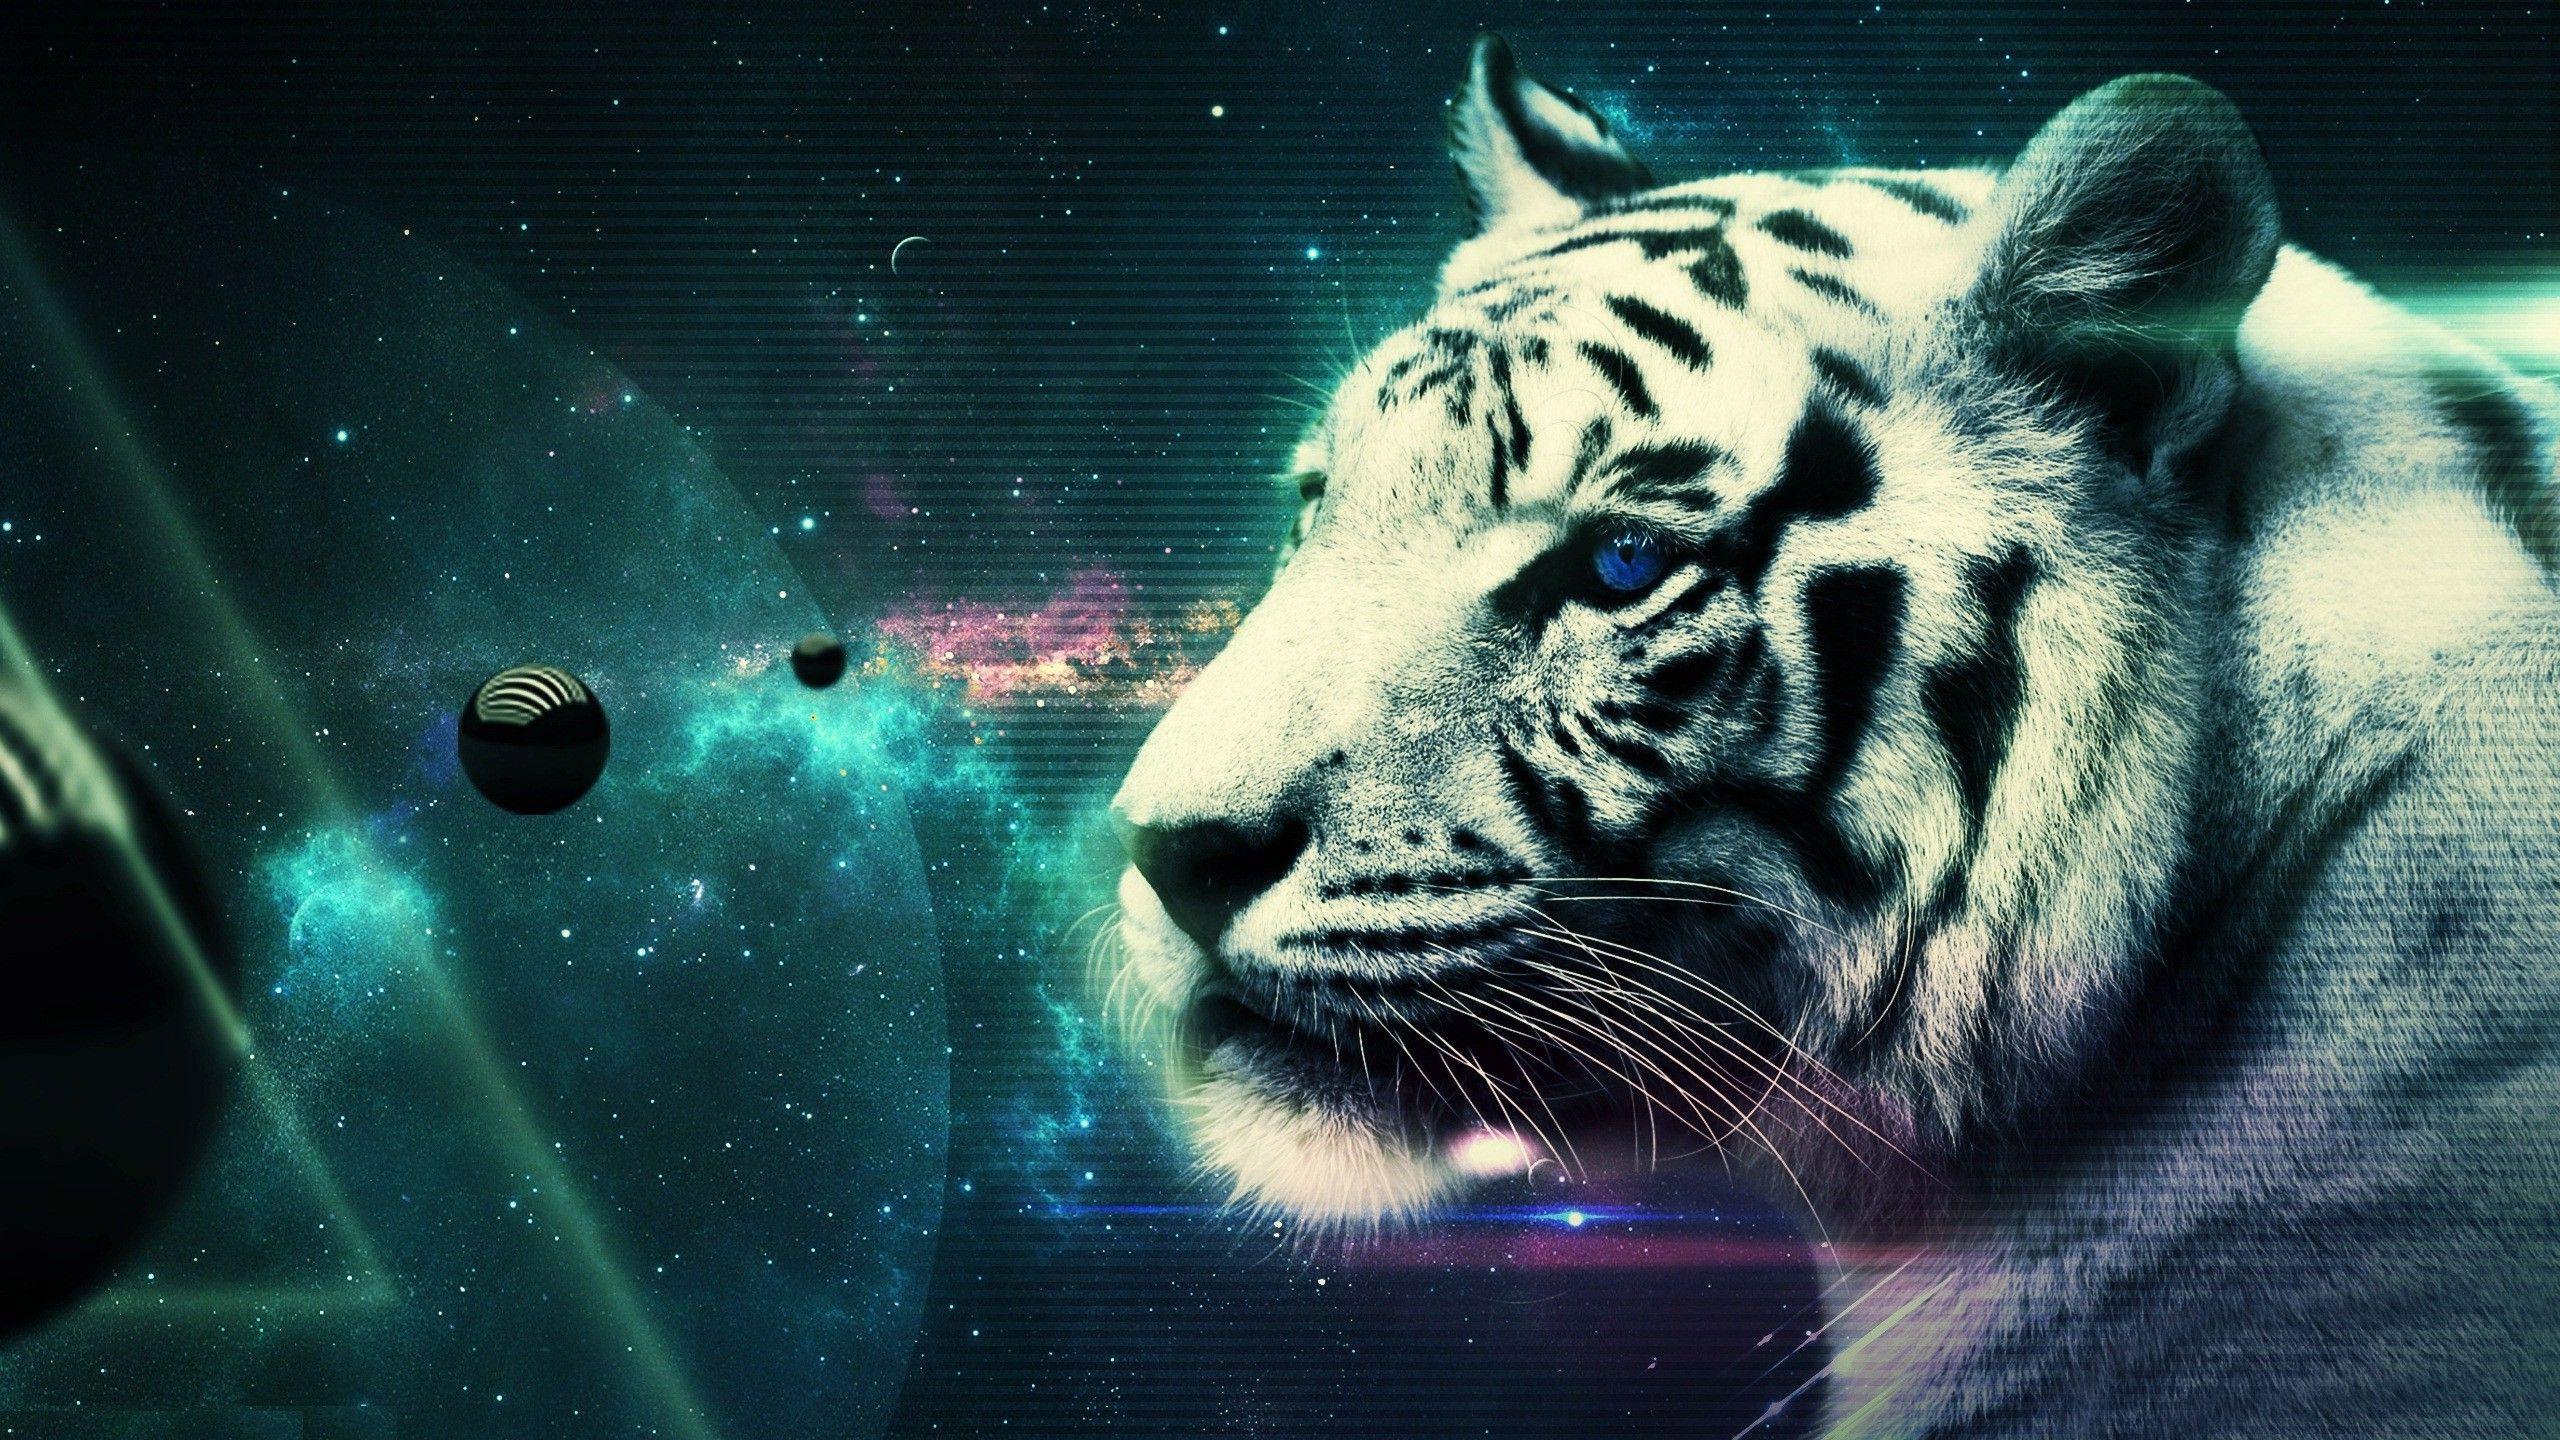 Japan Tigers HD Wallpapers Tiger Wallpaper for Desktop